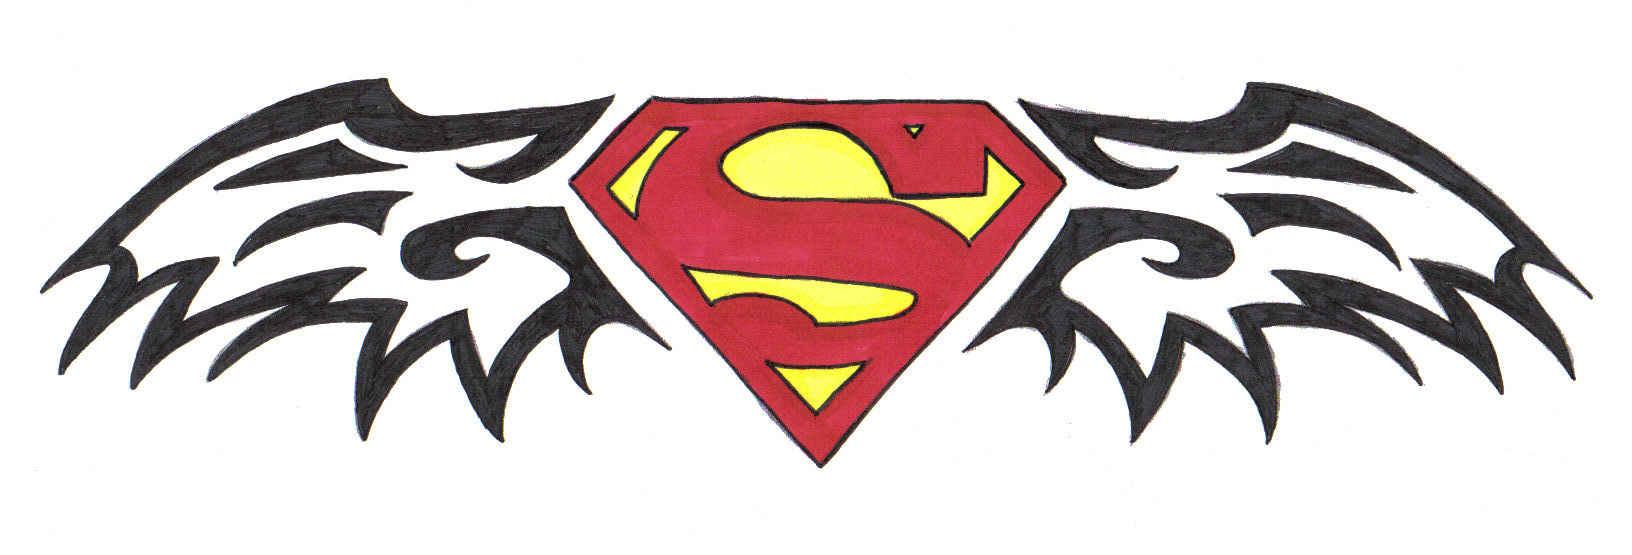 Superman Tribal Design 3 By Phantaz On Deviantart